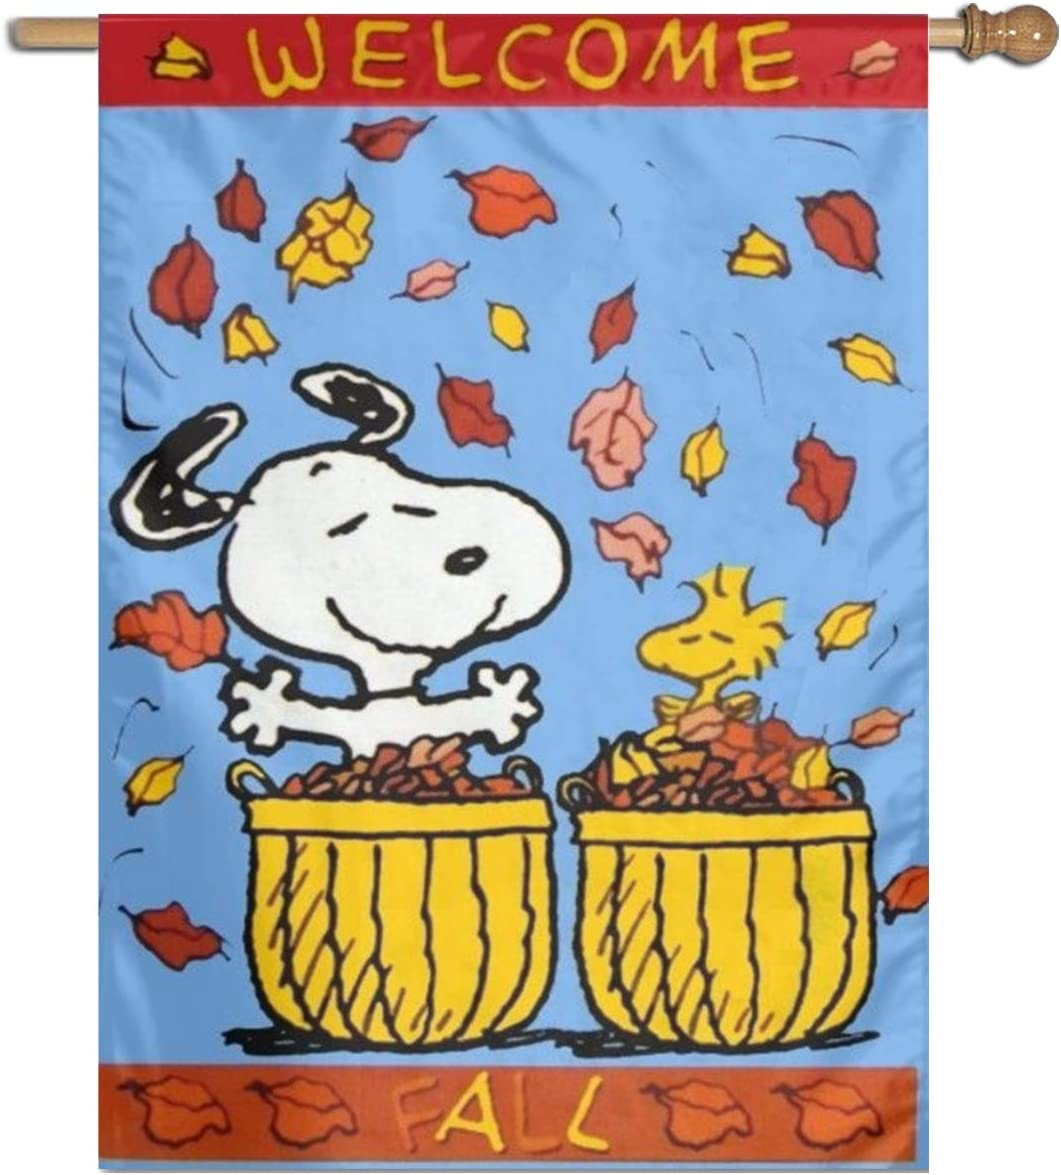 "LoV Snoopy Happy Fall (2) Garden Flag Home Outdoor Indoor Decor 27"""" X37 Inch"